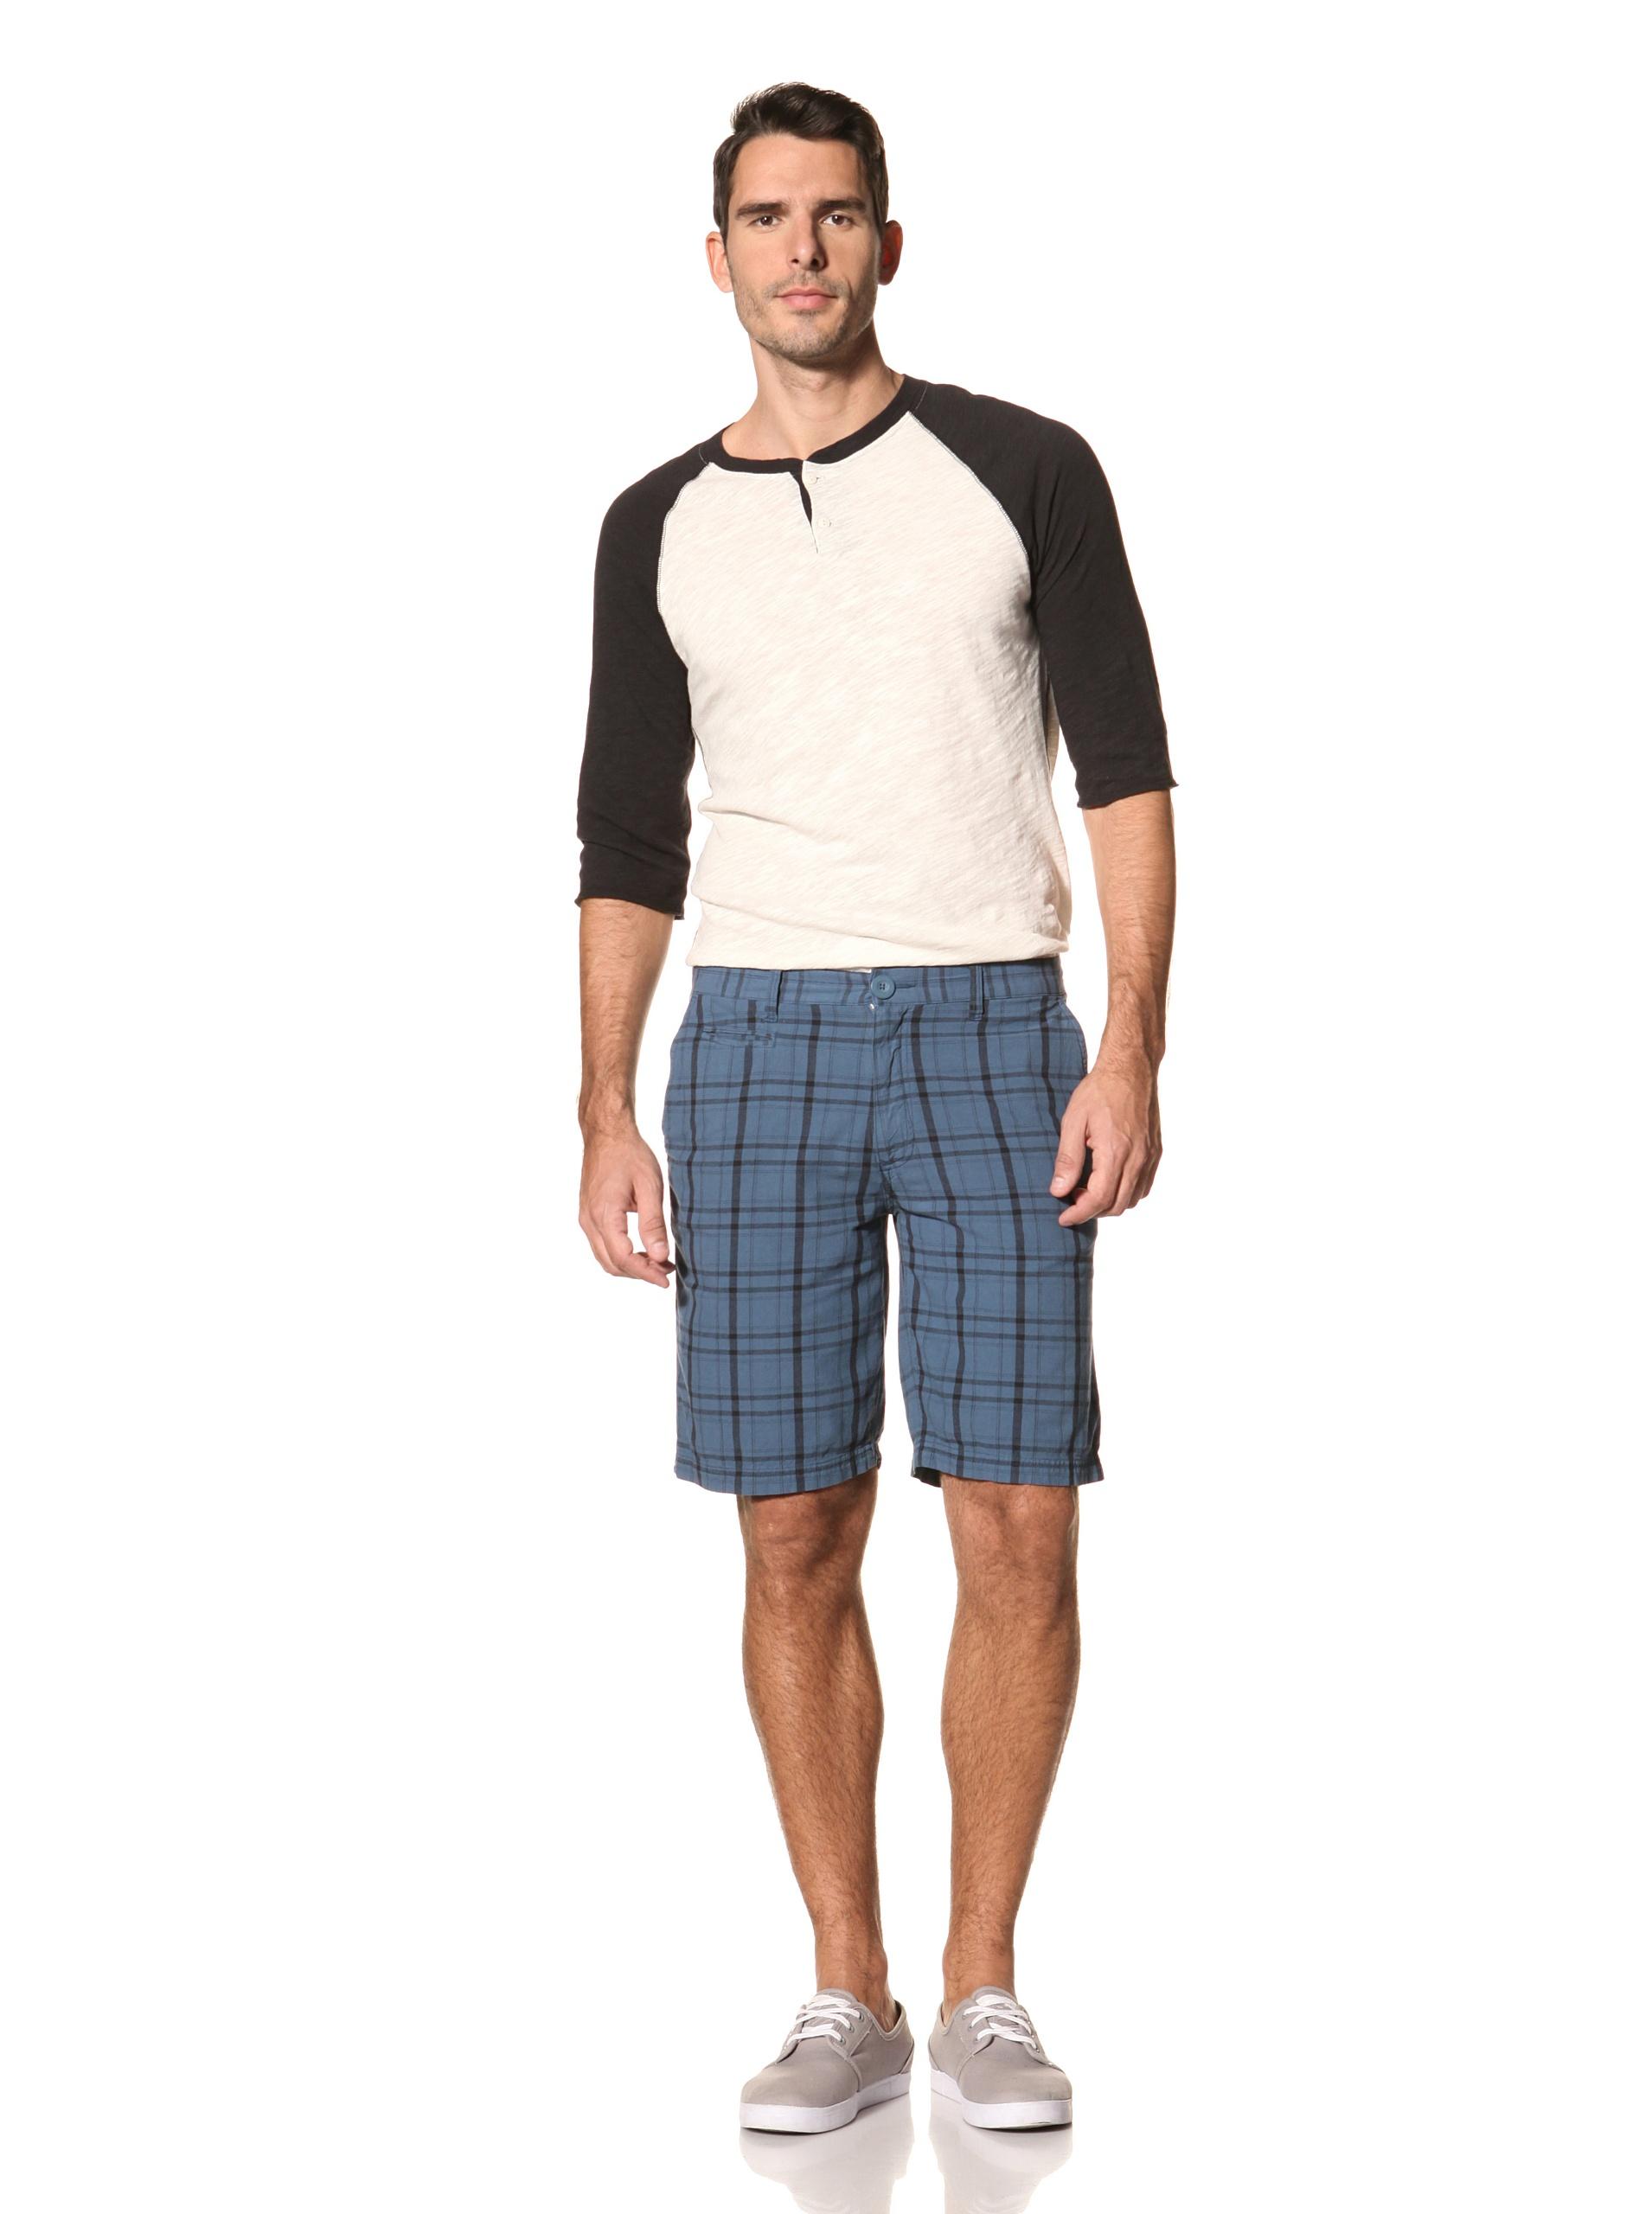 nüco Men's Plaid Shorts (Dark Teal)